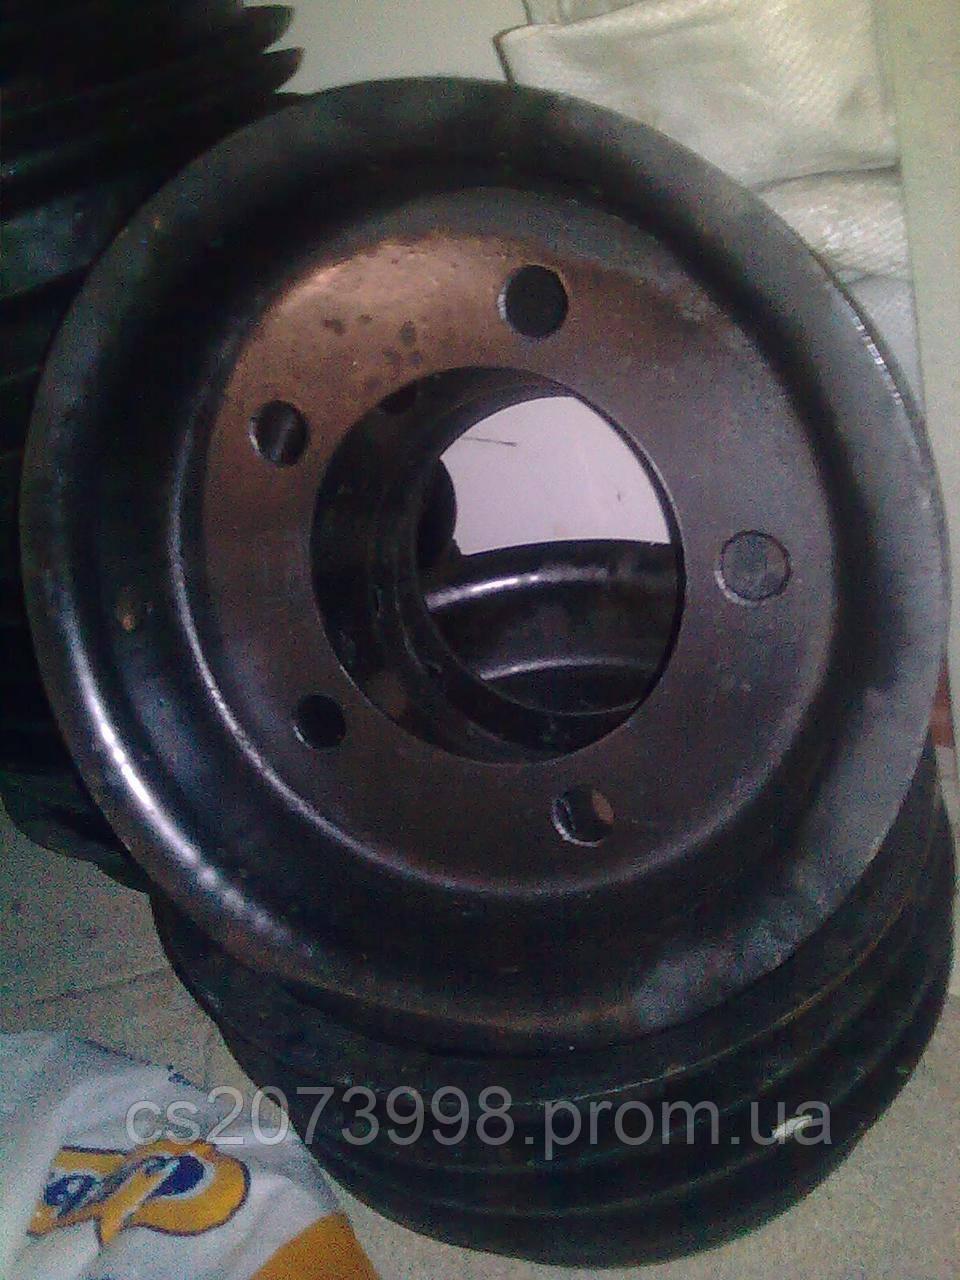 Обод Н 130.02.401, полудиск опорного колеса